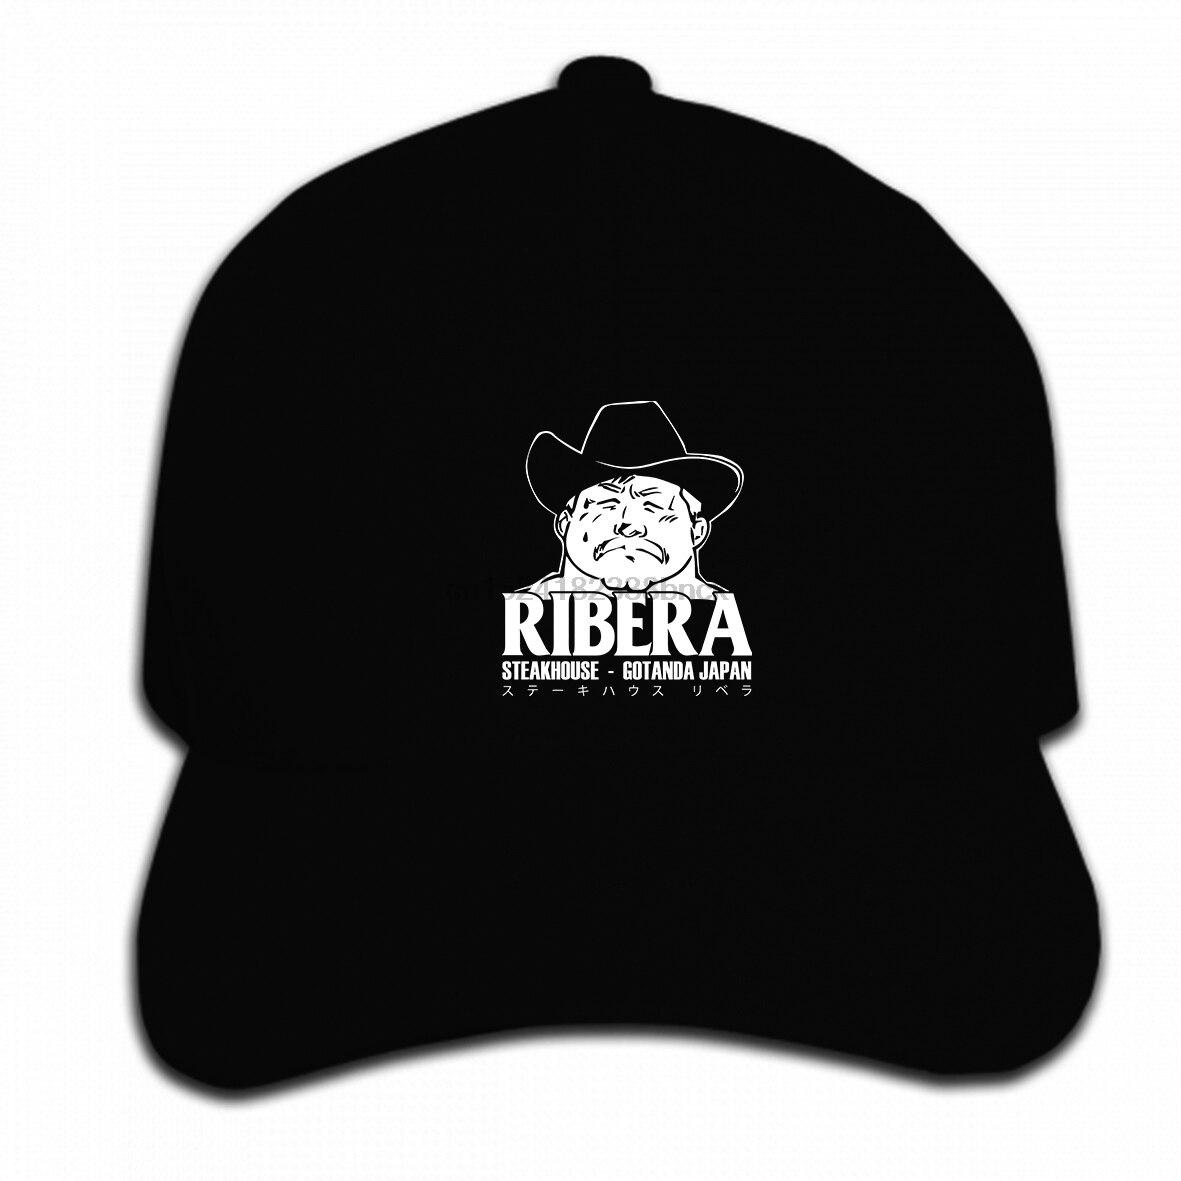 Imprimir gorra de béisbol personalizada Hip Hop hombres Stan Hansen Ribera Steakhouse v2 mujeres sombrero pico Cap